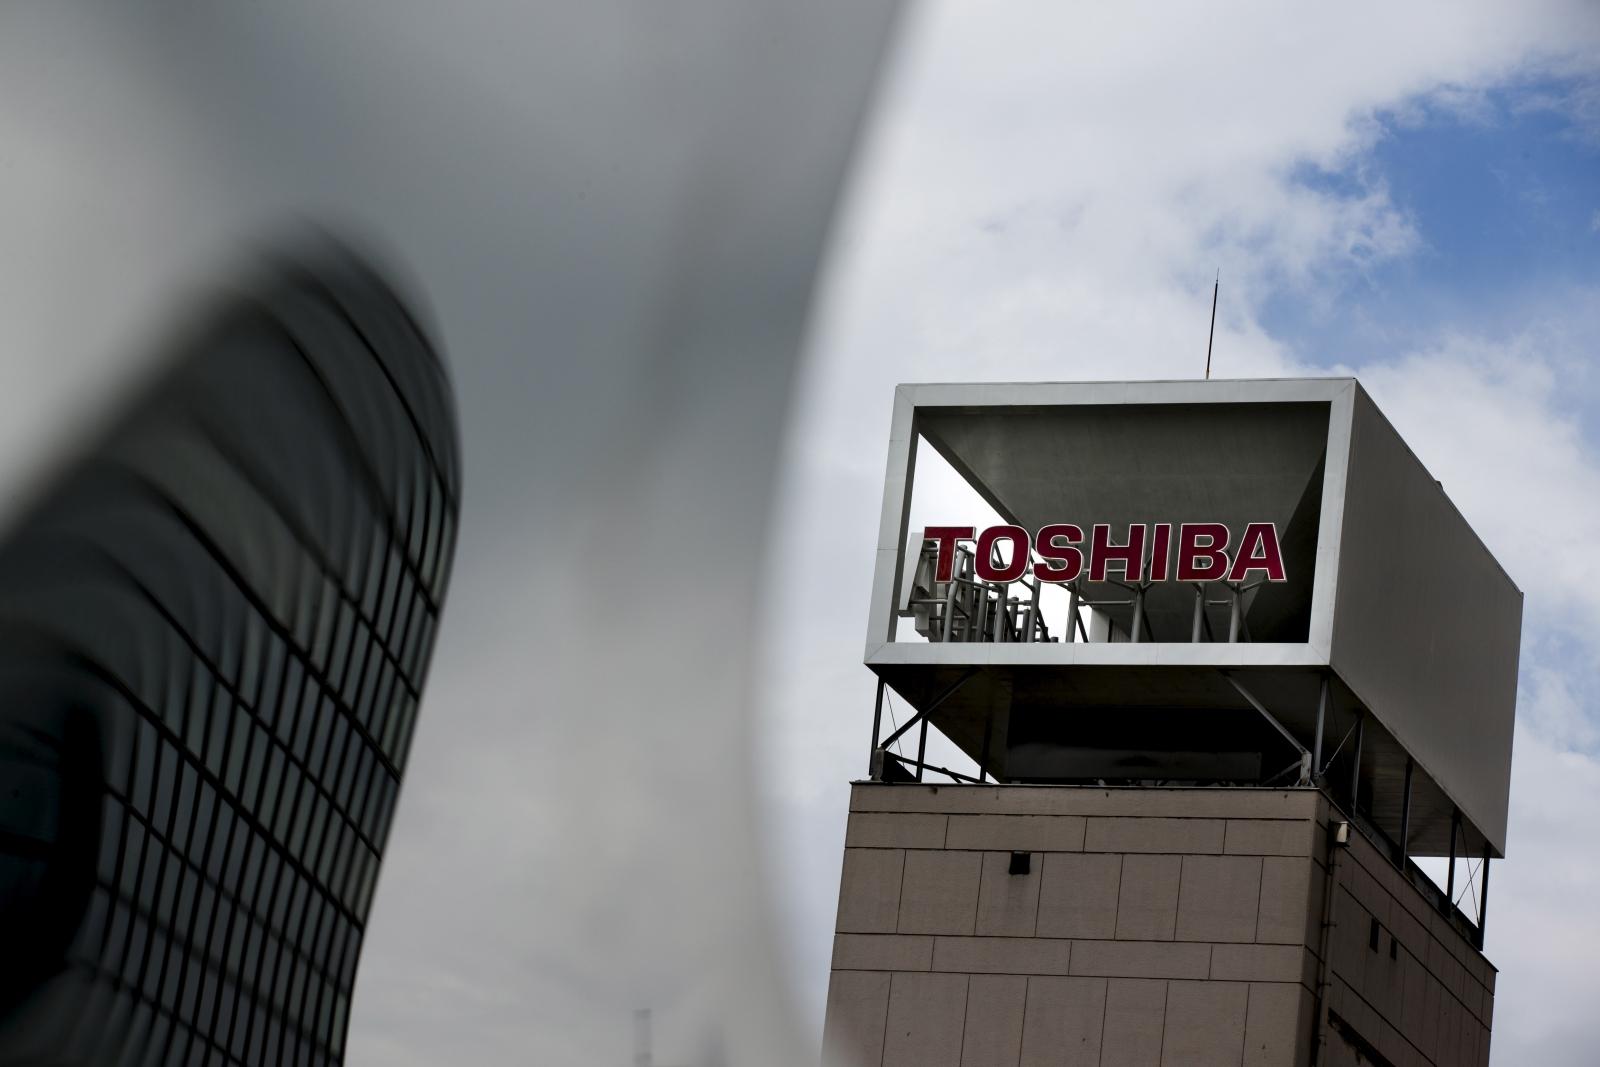 Toshiba headquarters, Tokyo